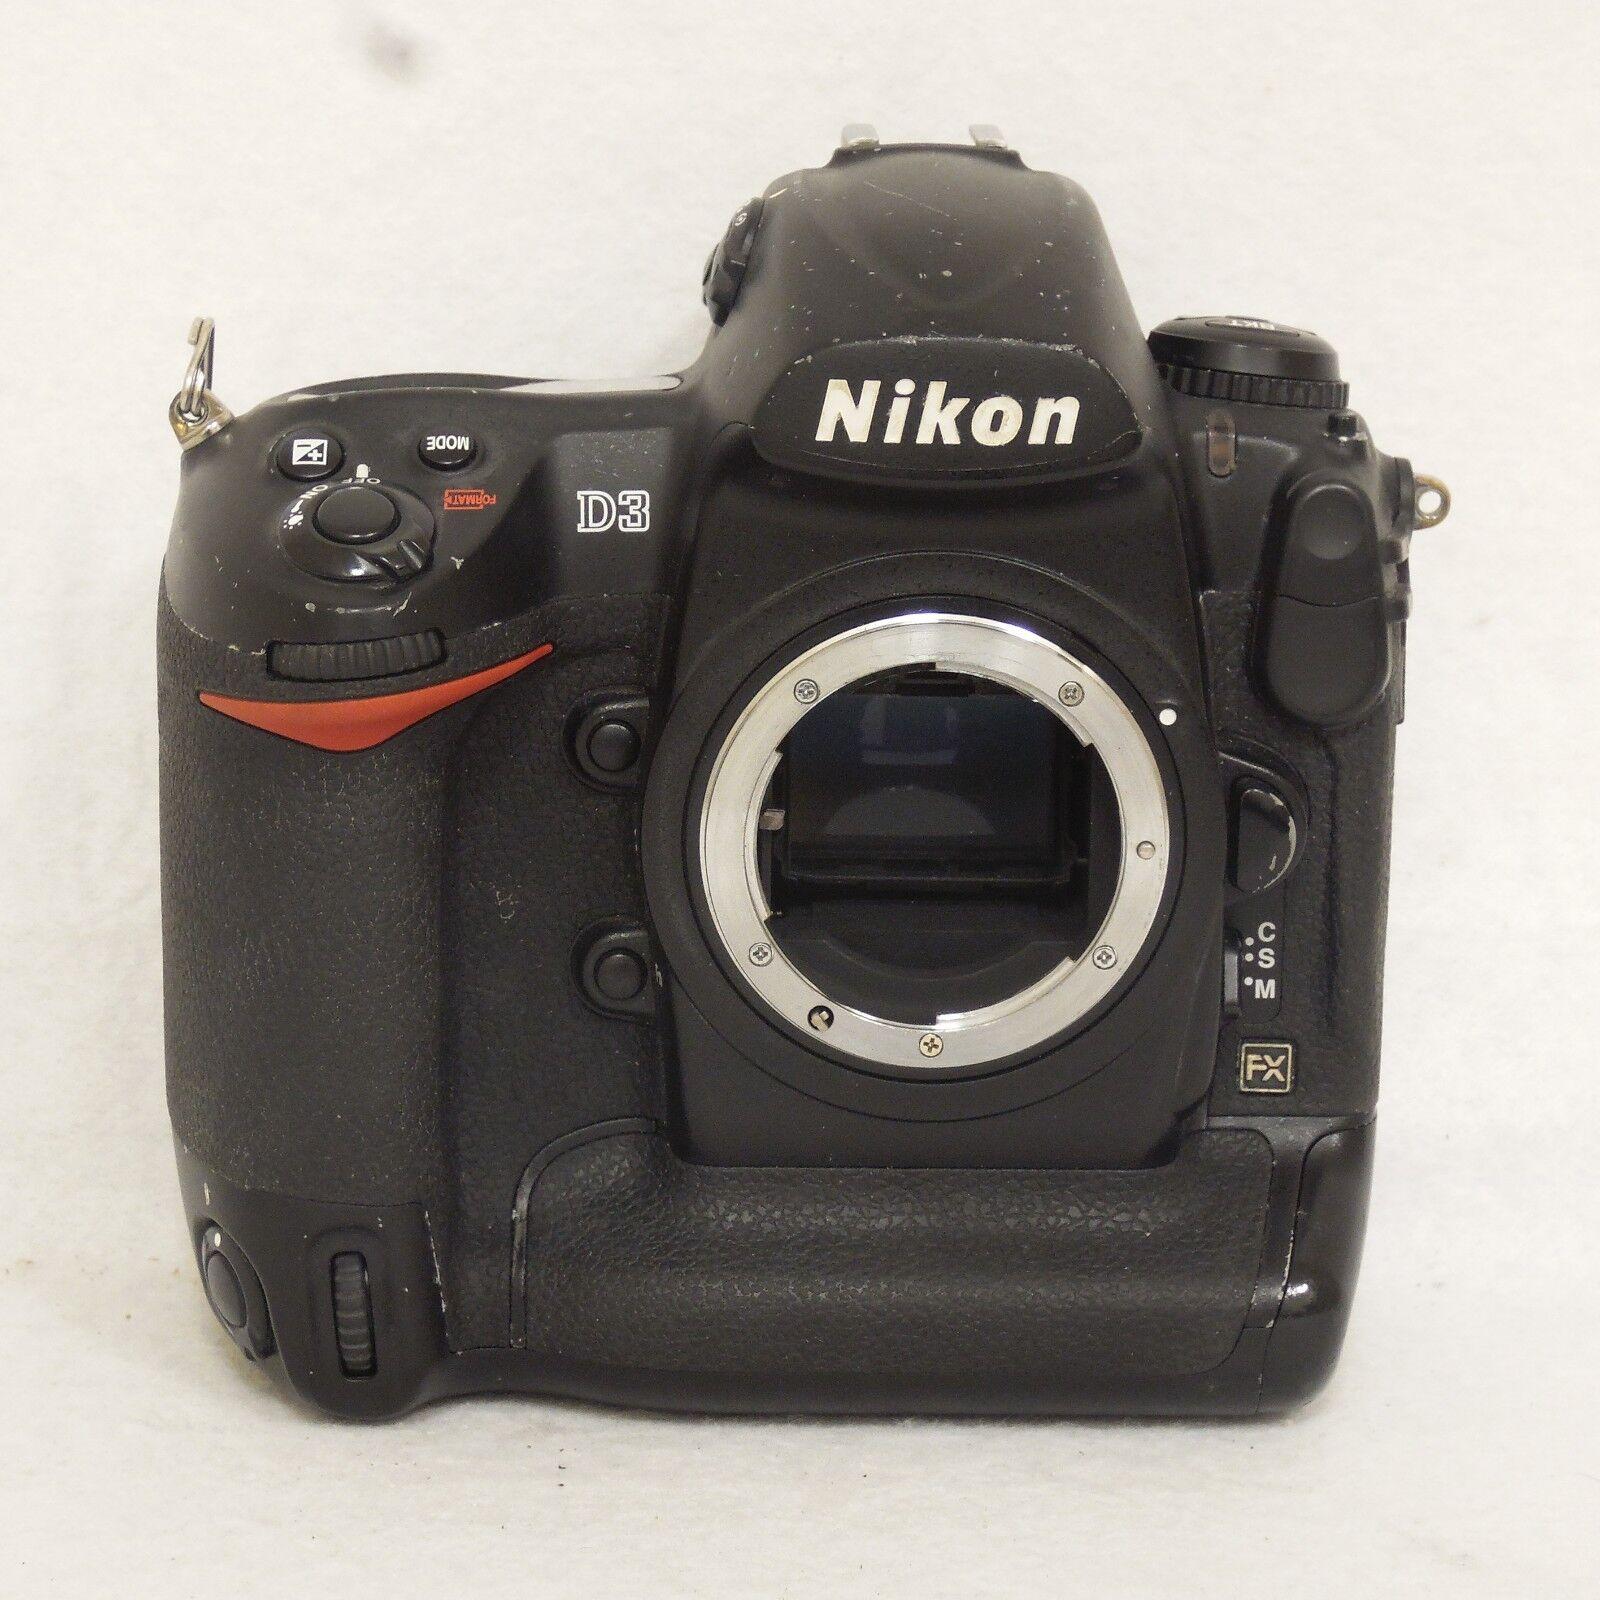 nikon-d3-12-1mp-digital-slr-camera-body-only-black-25434-free-shipping